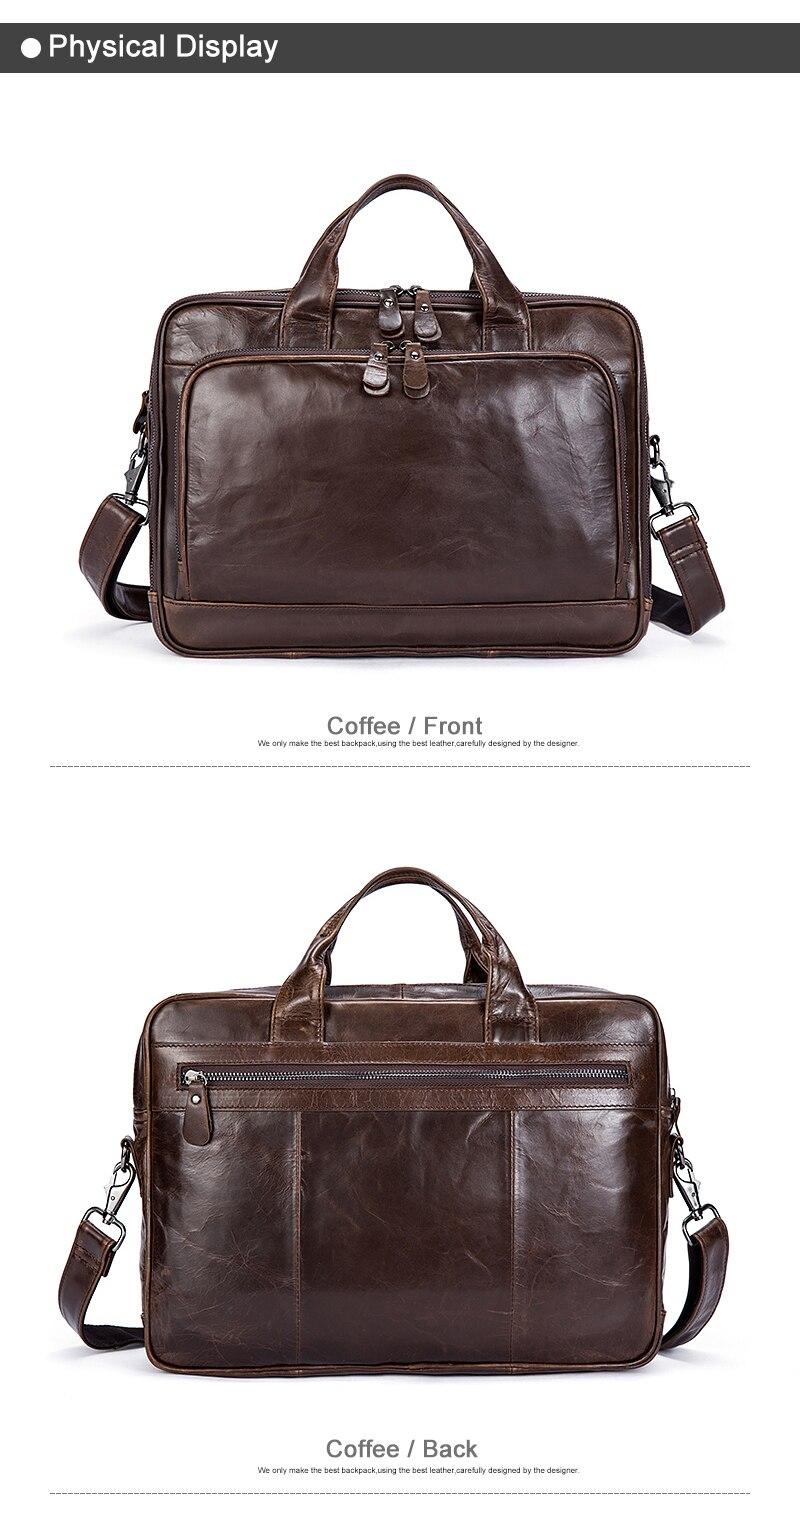 MVA Genuine Leather Briefcase Laptop men's bags Messenger Shoulder Bags Men's Leather bag Briefcases Laptop Crossbody Bags 8979